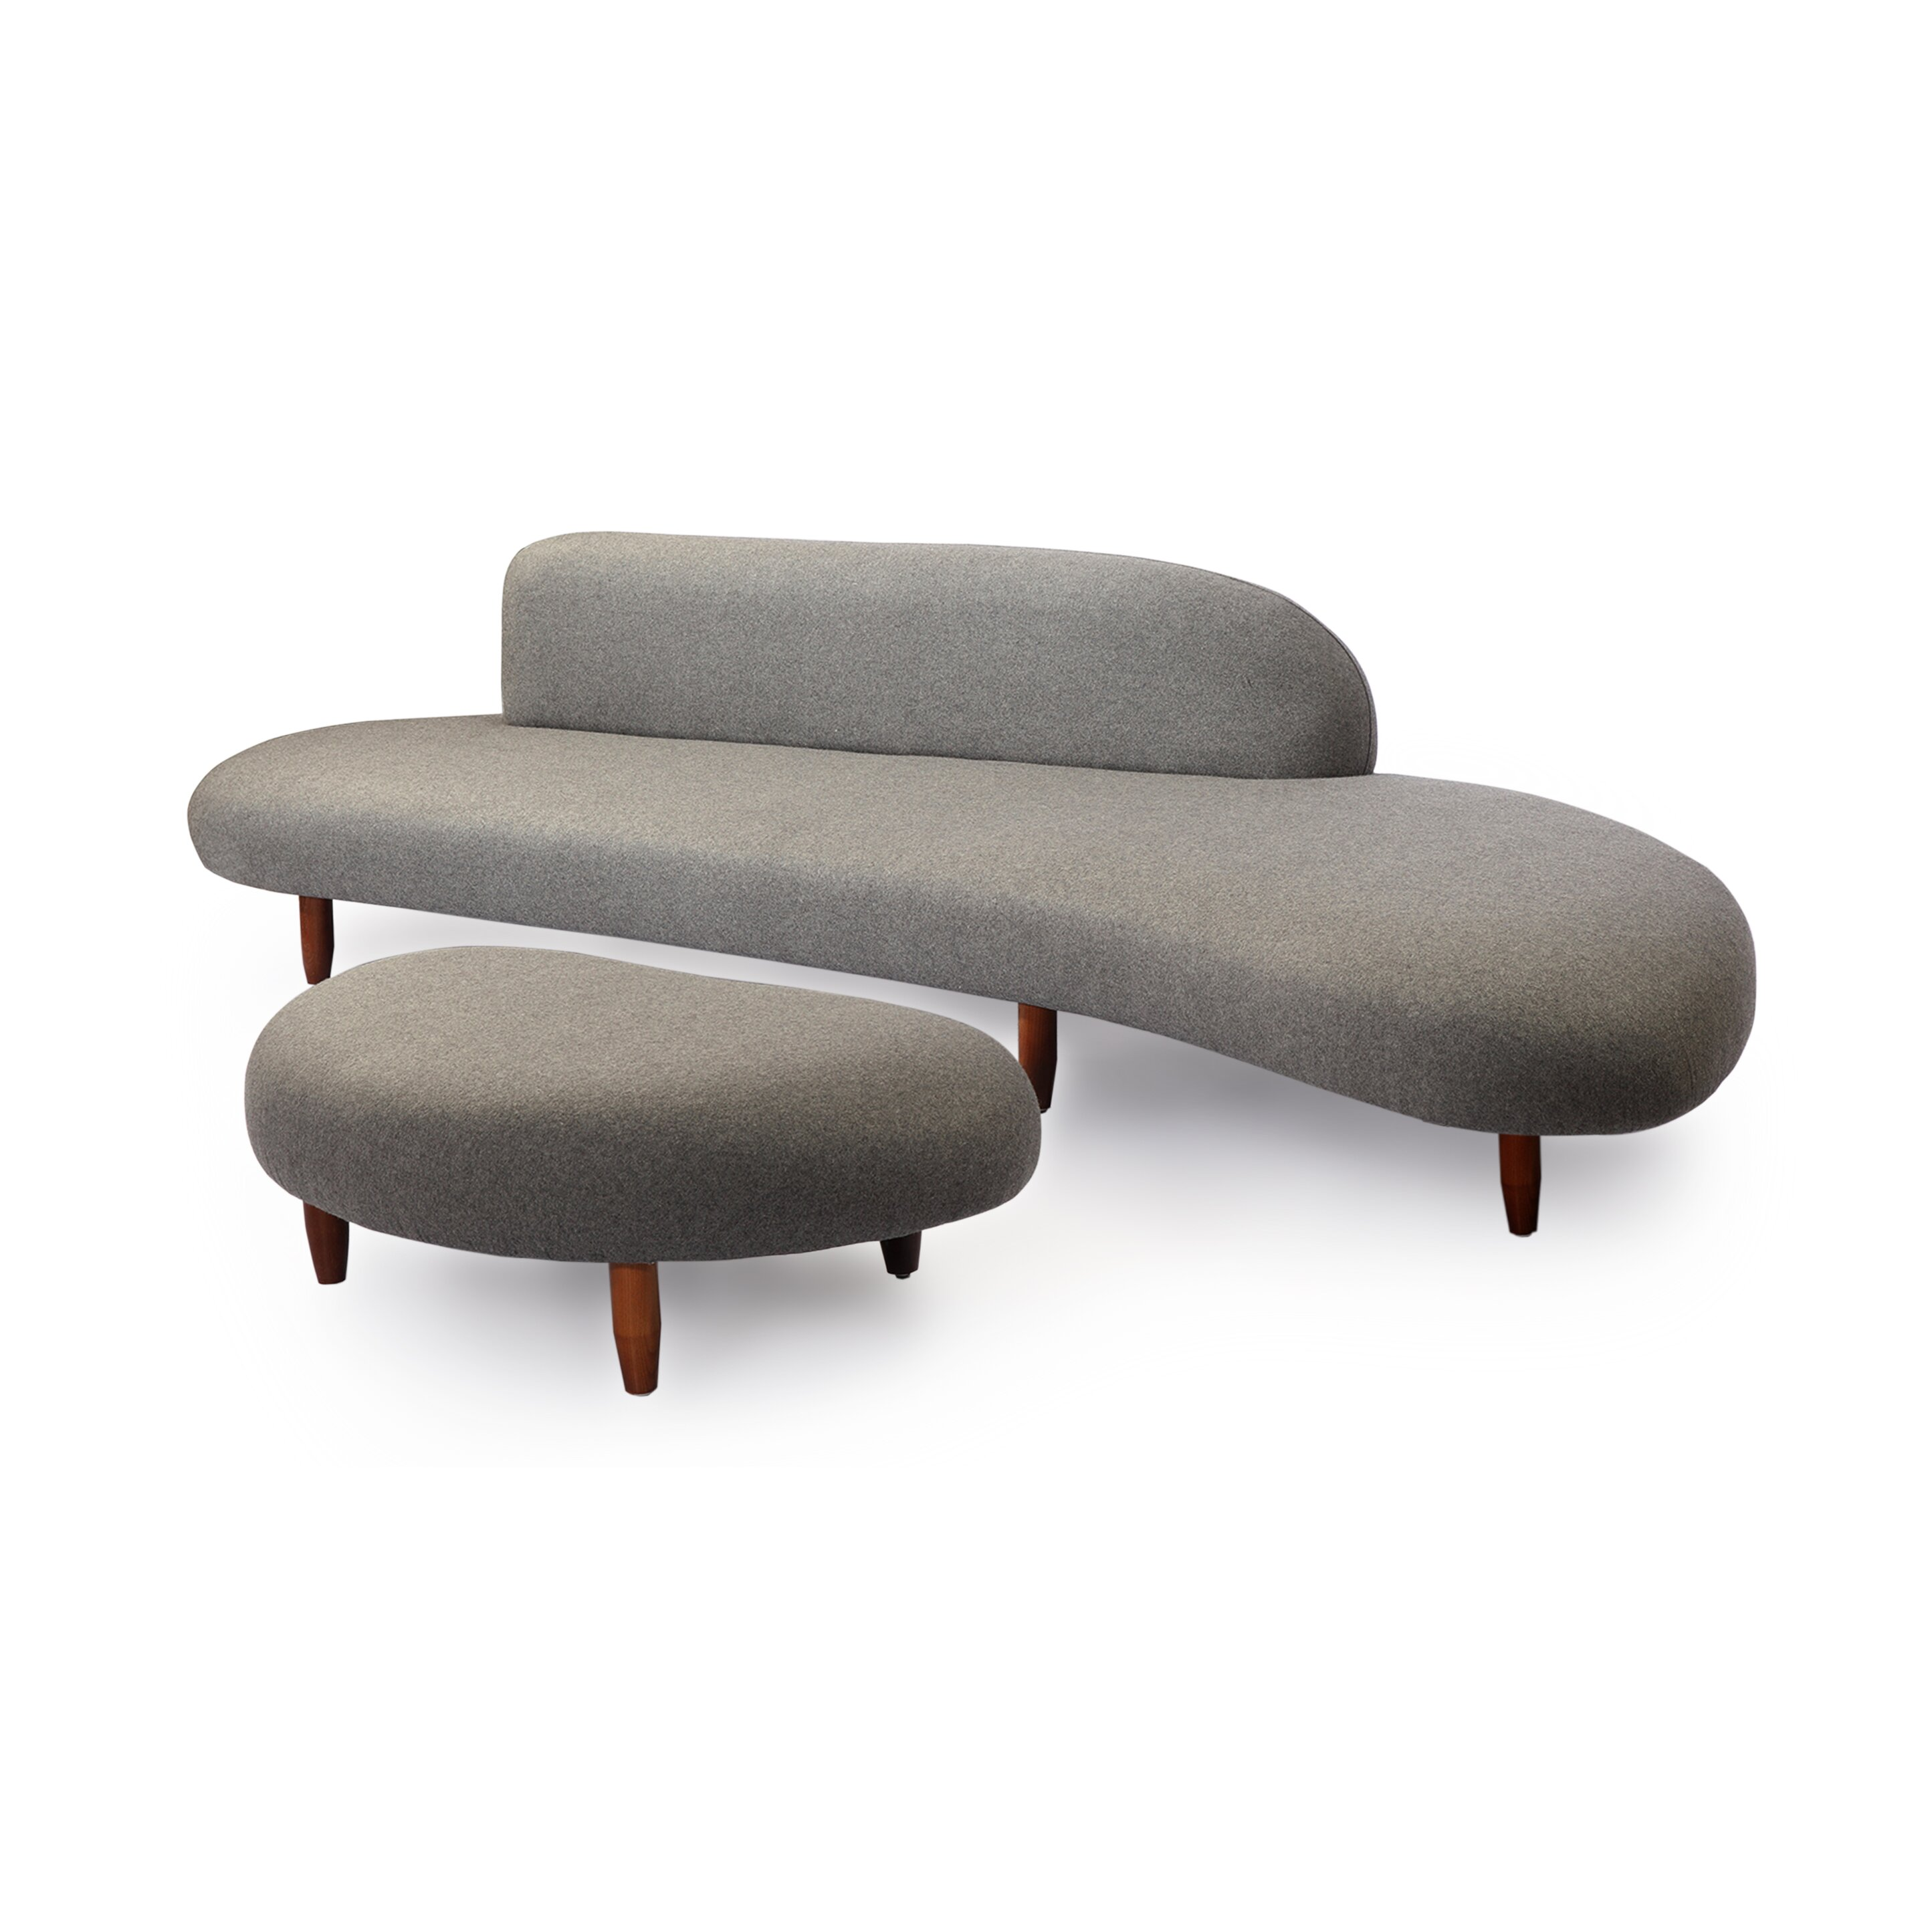 Kardiel kidney bean mid century modern sofa and ottoman set reviews wayfair - Mid century modern chair and ottoman ...